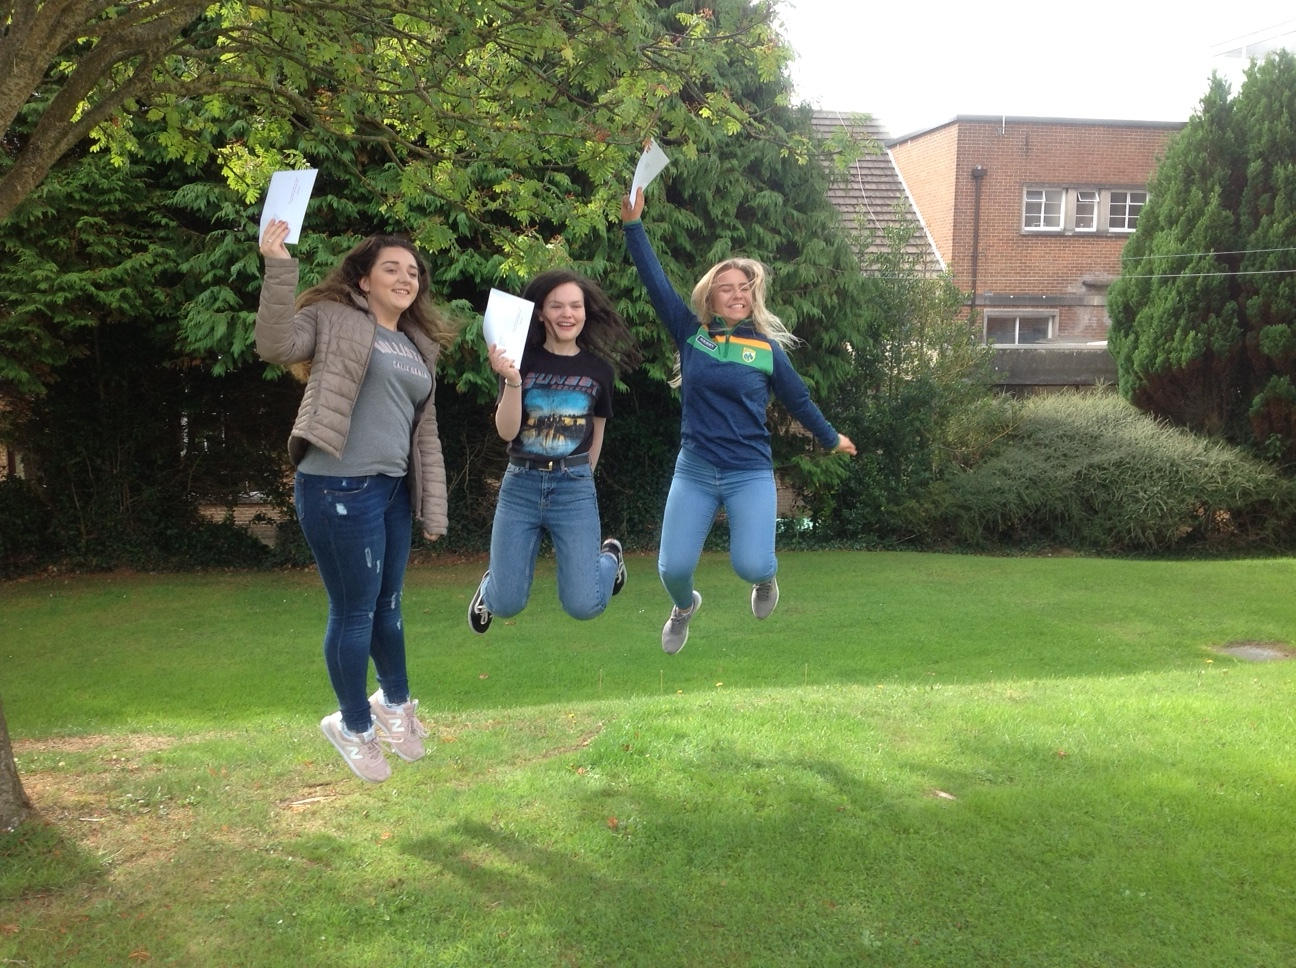 3 girls jumping.JPG